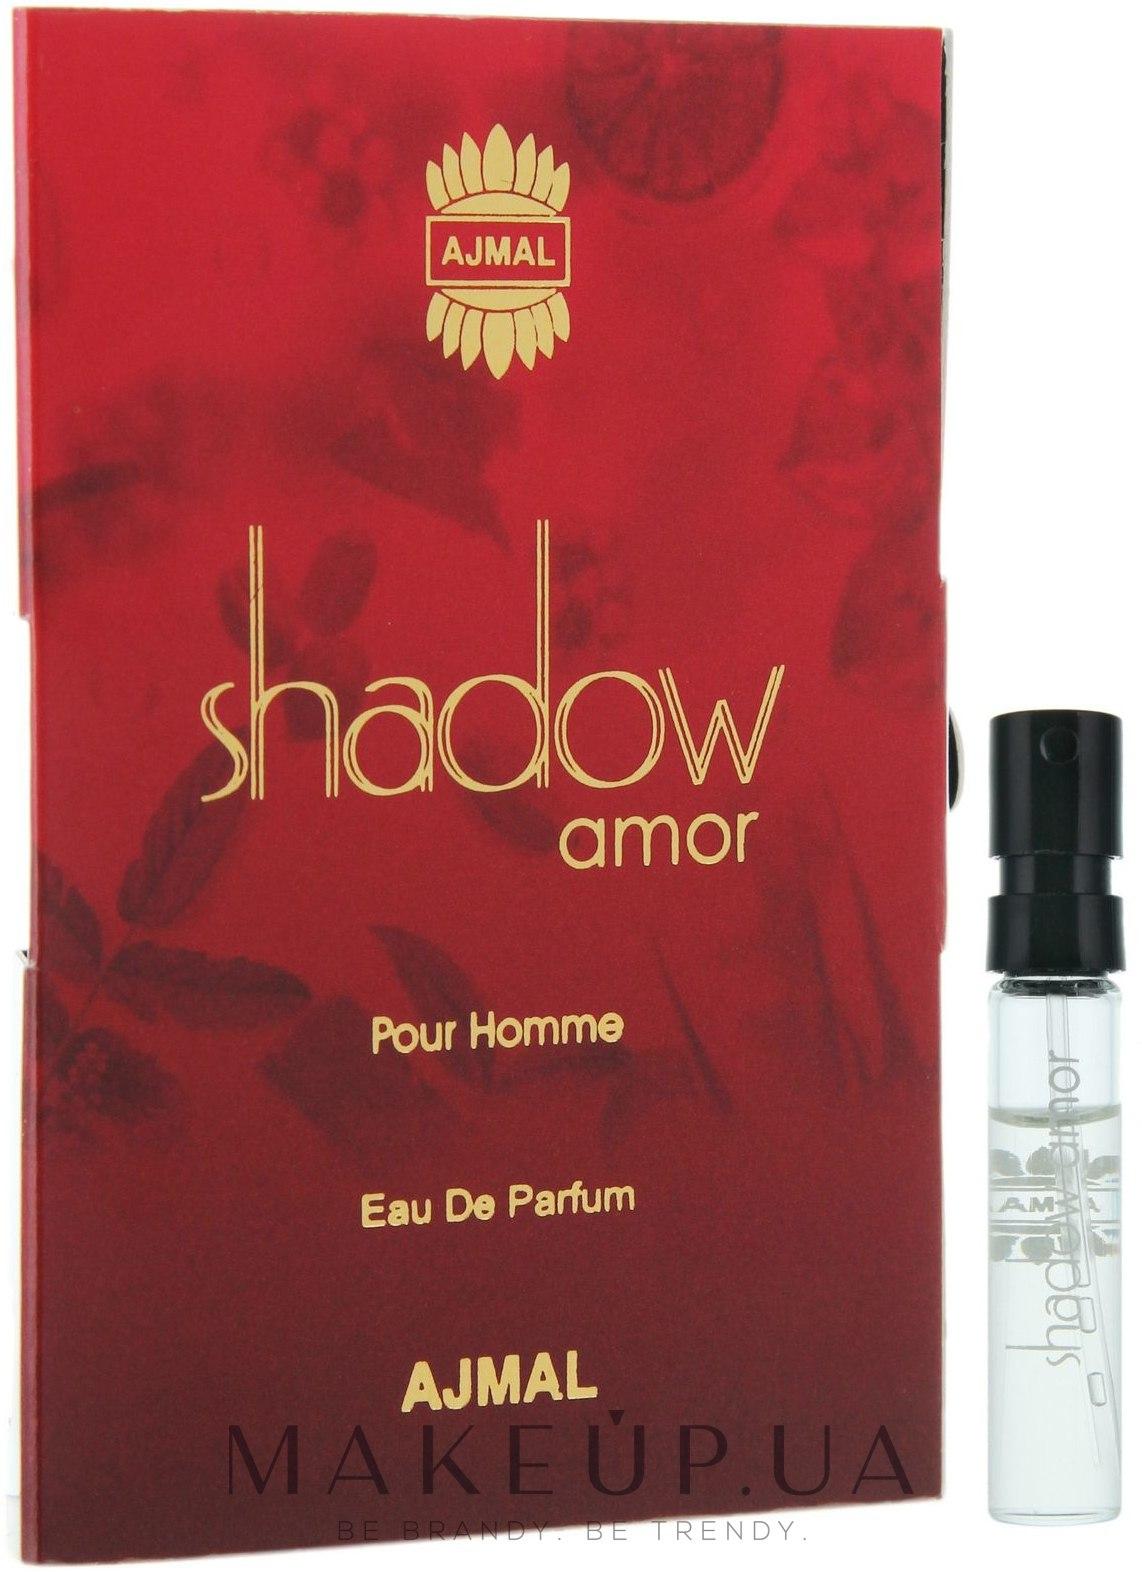 Makeup отзывы о Ajmal Shadow Amor Pour Homme парфюмированная